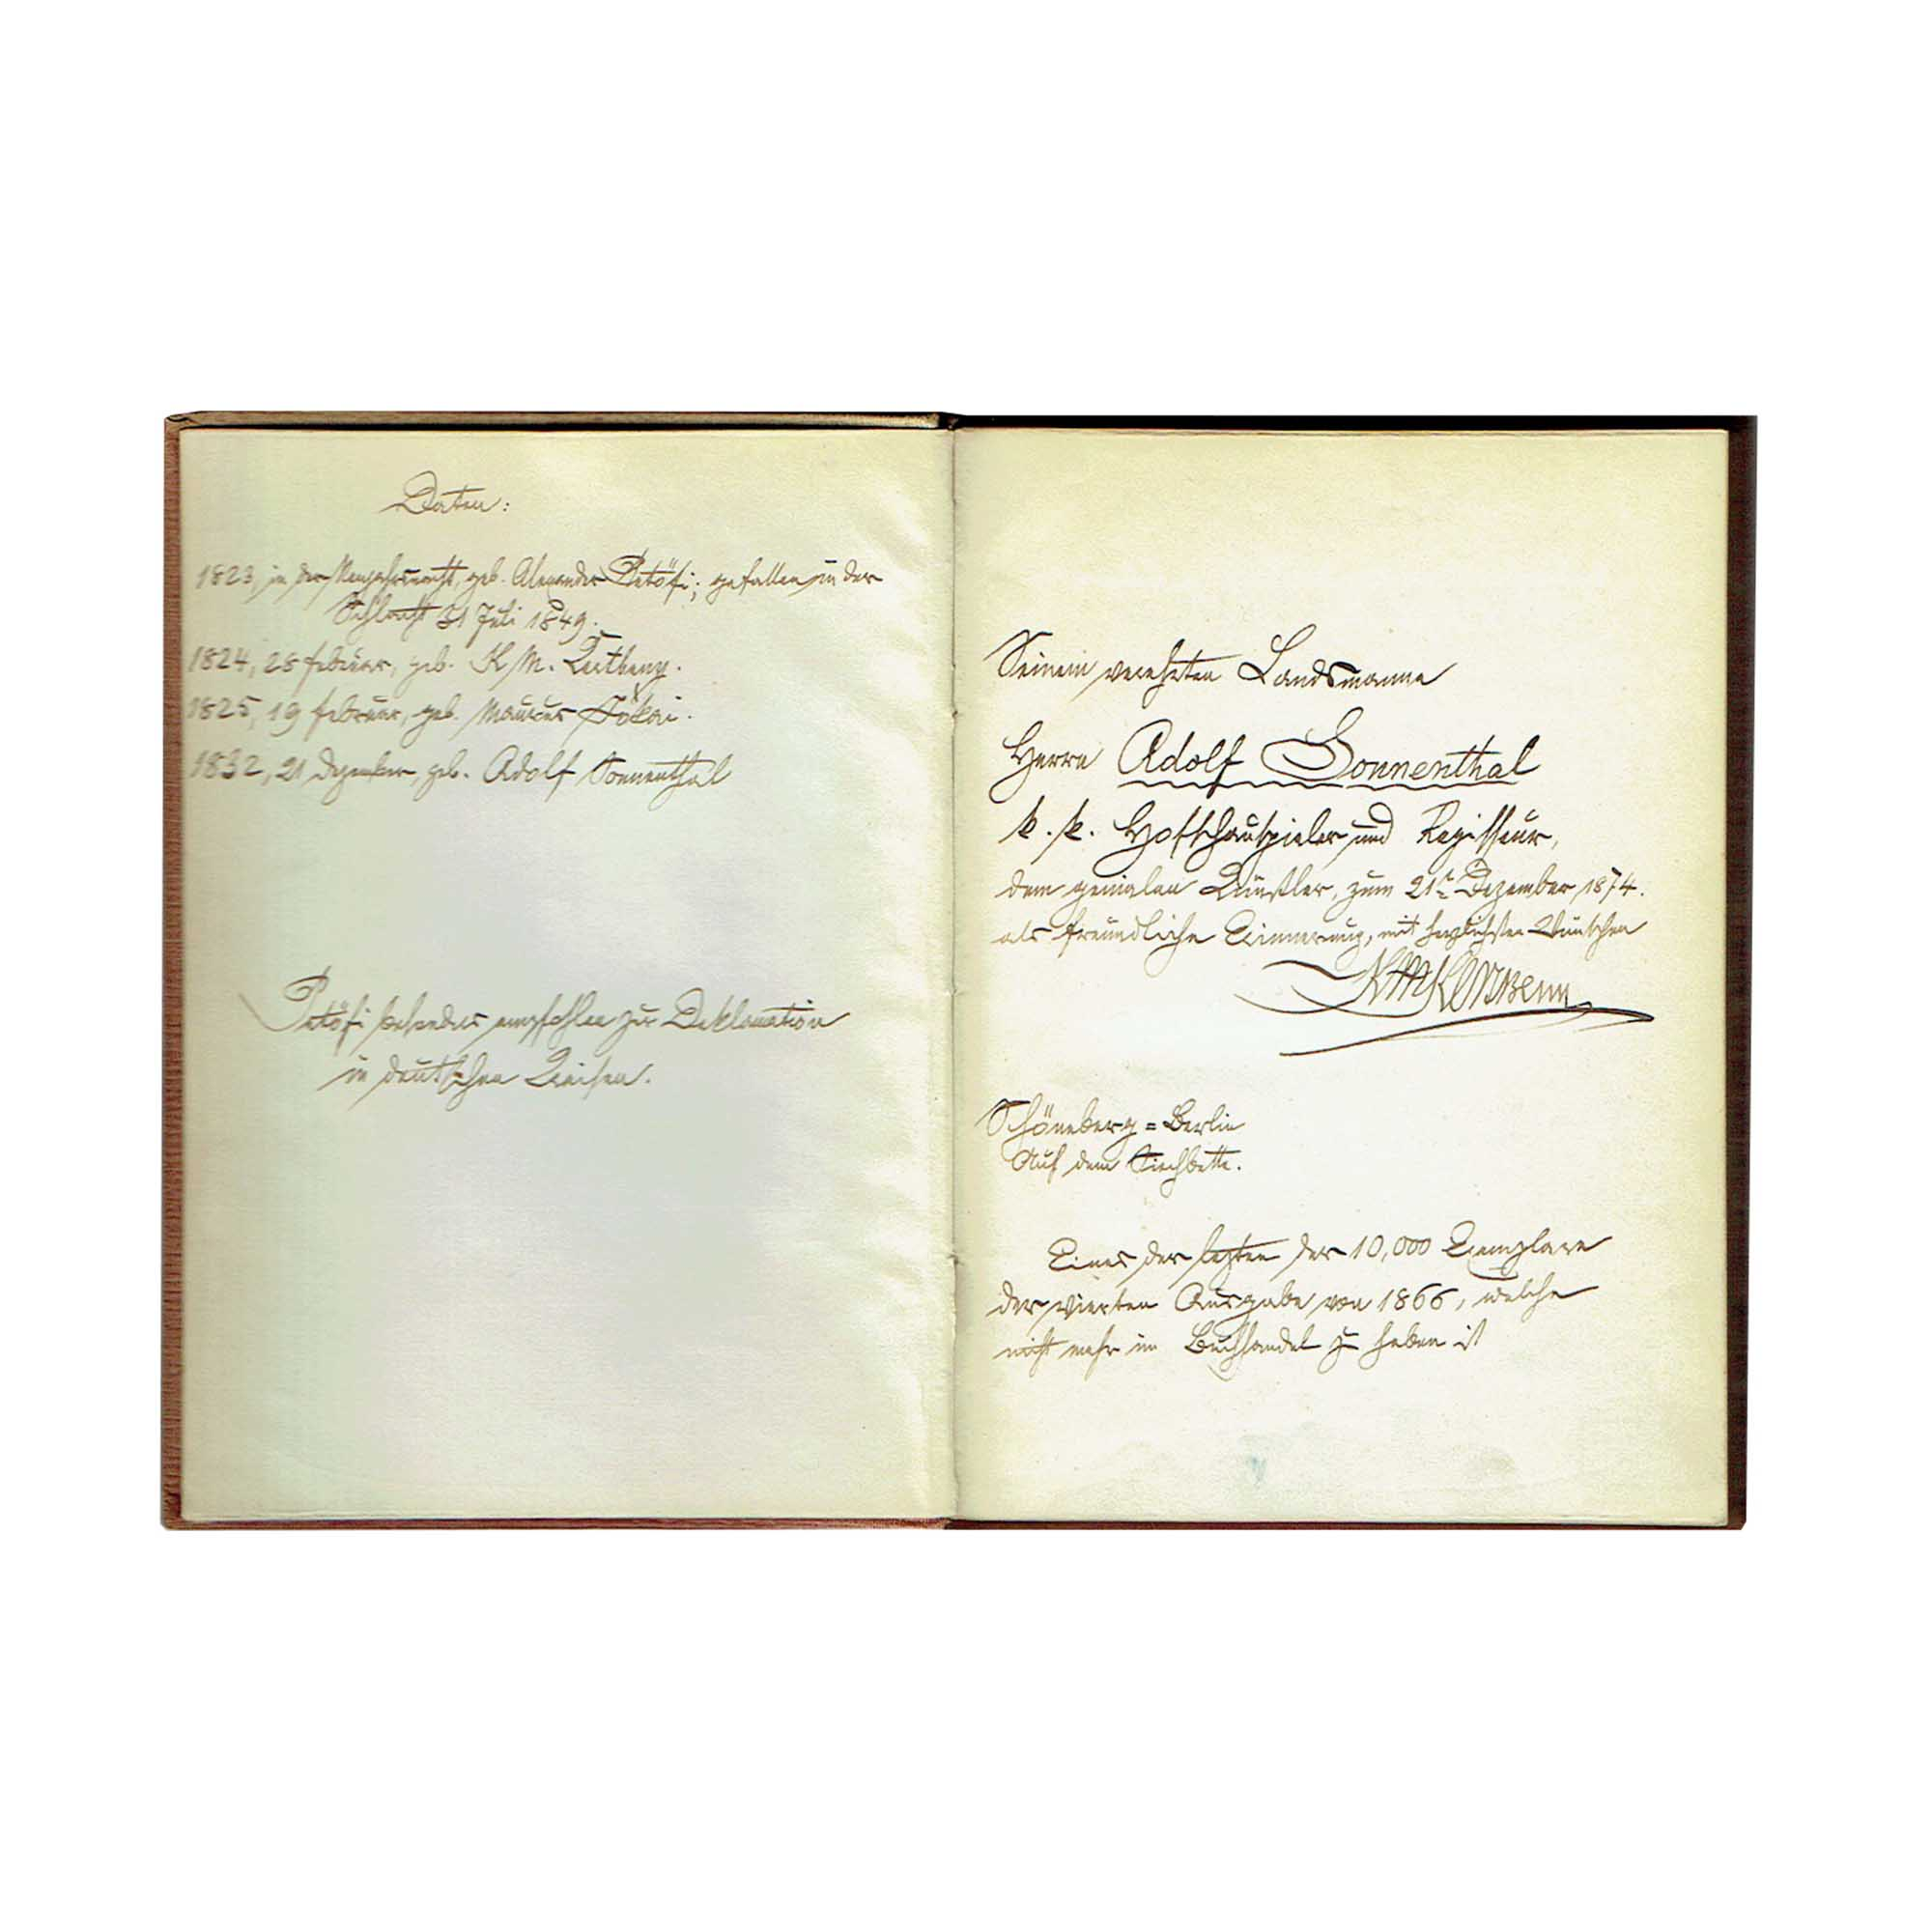 5269-Kertbeny-Sonnenthal-Widmung-Petöfi-Gedichte-1866-N.jpg